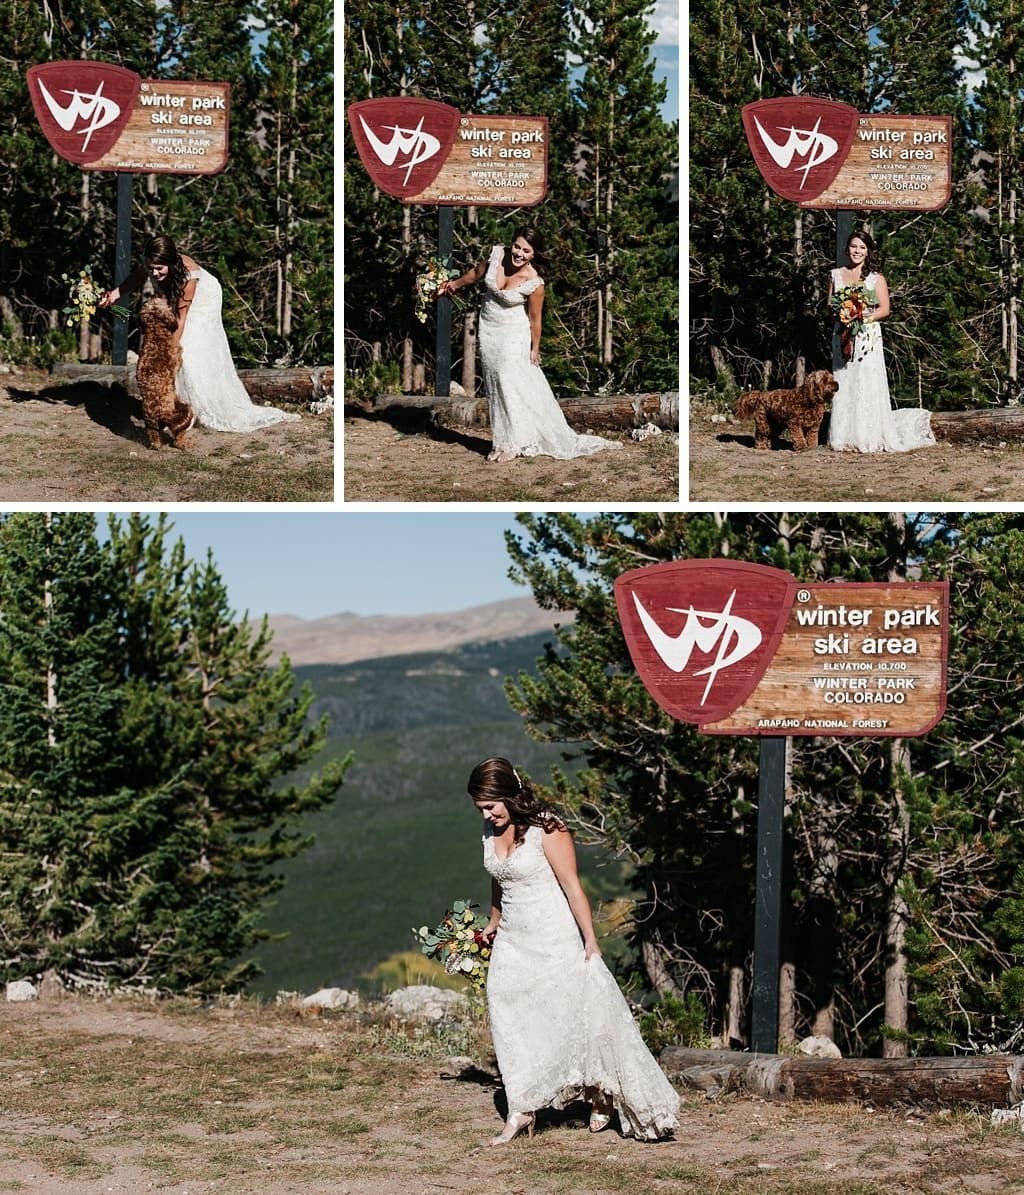 Sunspot Lodge Winter Park Resort Wedding bride with dog